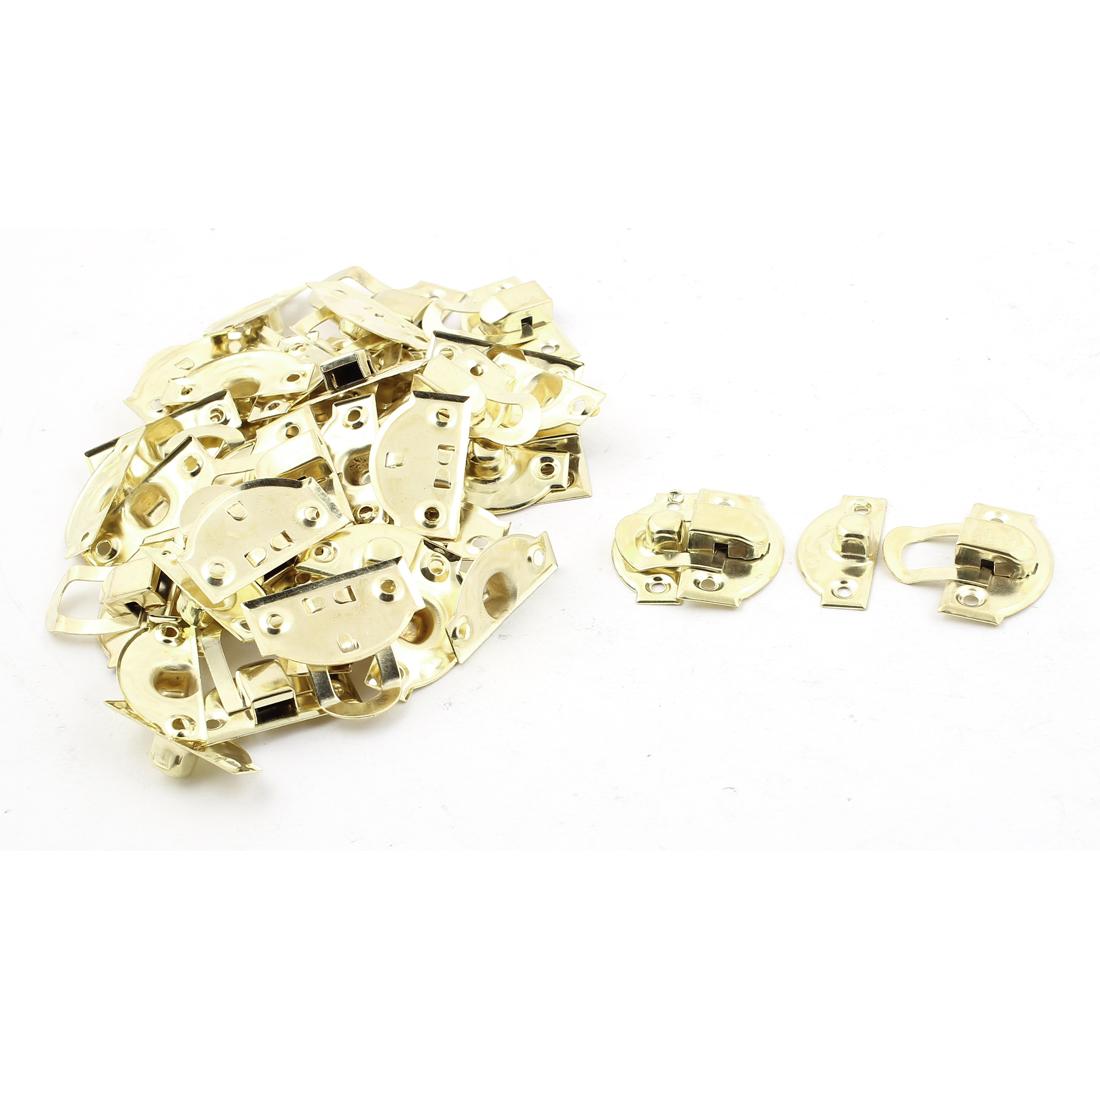 Jewelry Case Box Decor Suitcase Hasp Lock Latch Gold Tone 23PCS